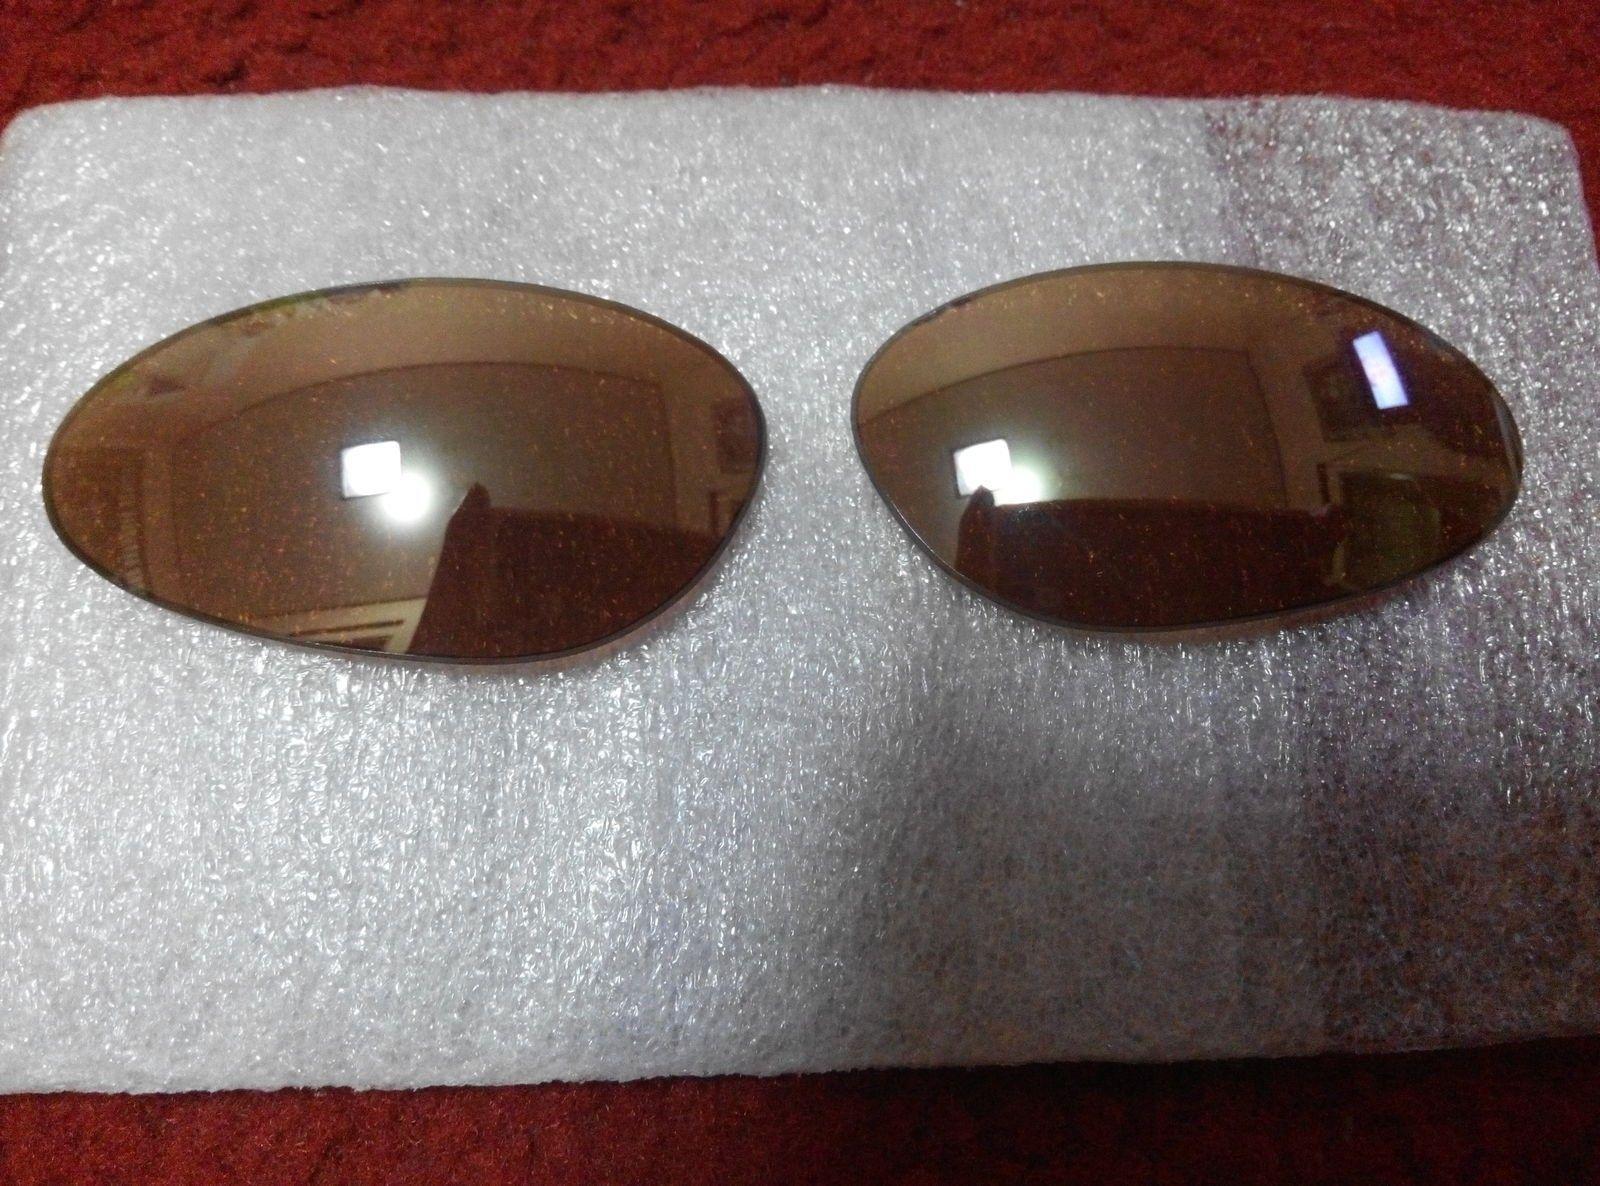 Authentic vr28 iridium lens for penny - IMG_20150205_074538.jpg